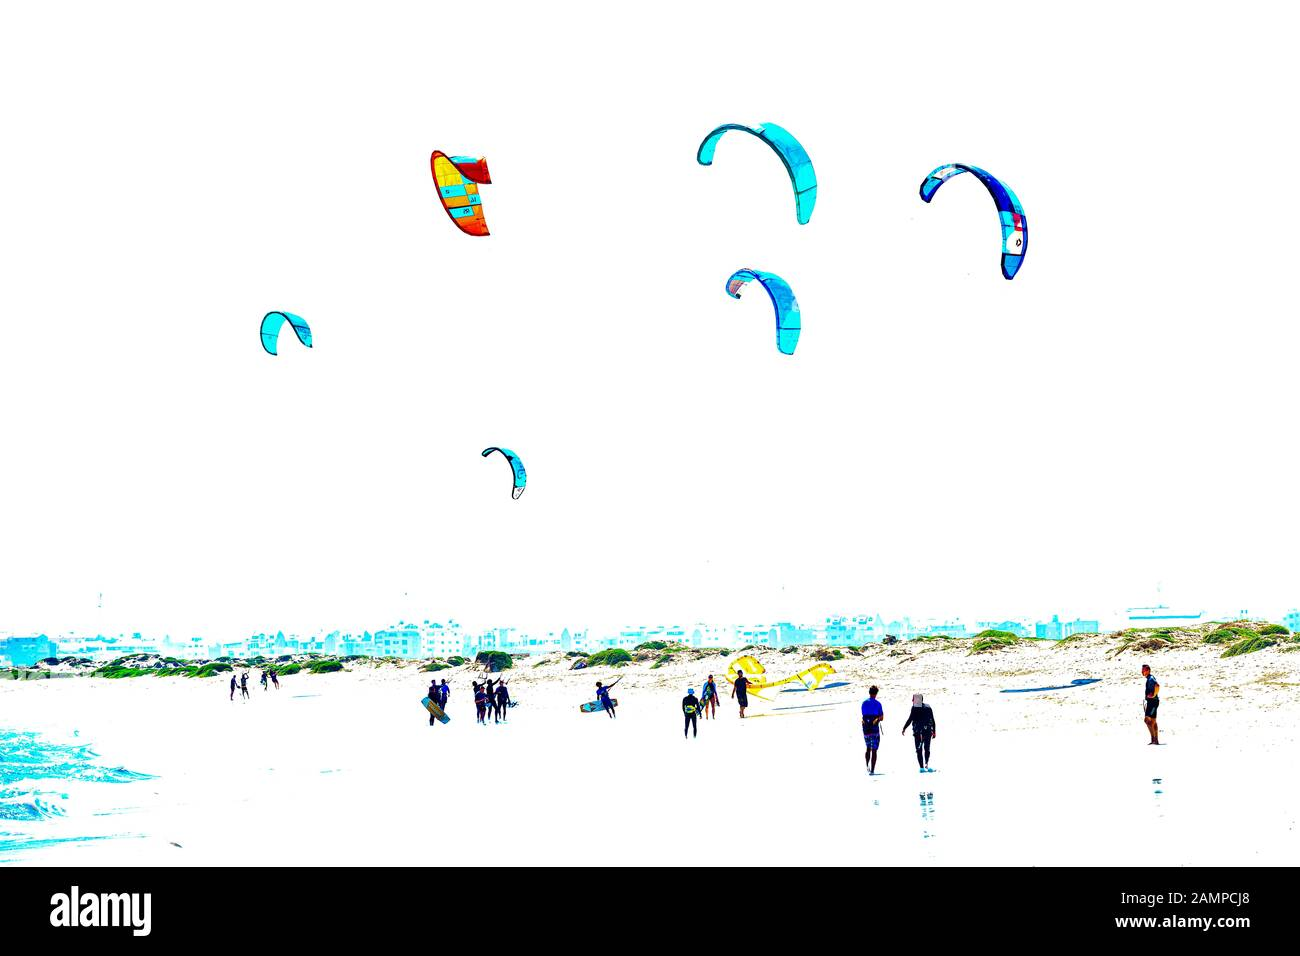 Kitesurfer with colourful sails on the beach, Santa Maria, Sal Island, Cape Verde Stock Photo